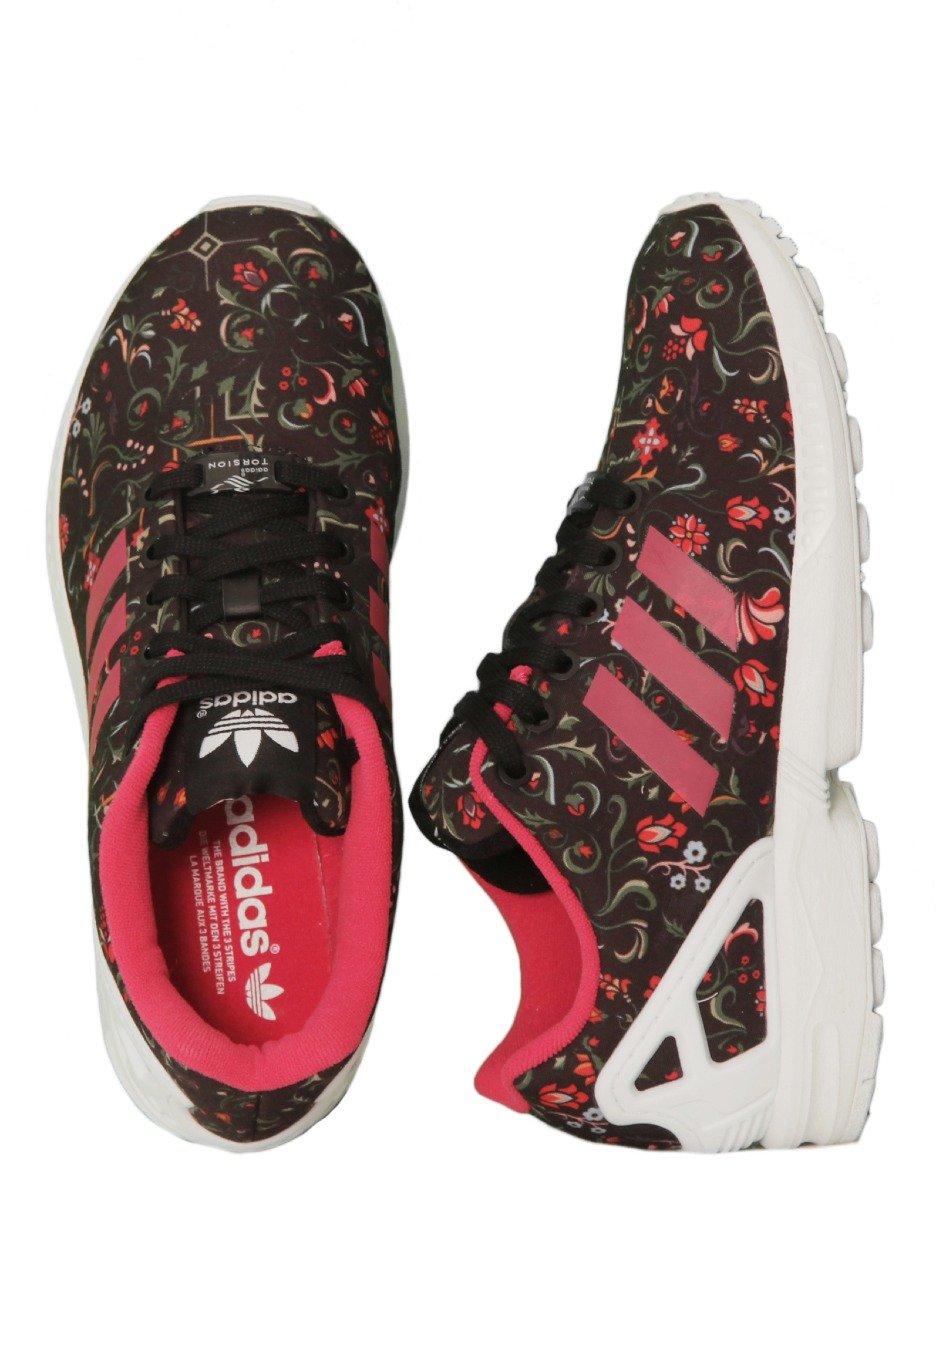 ecc0ee010645e Adidas - ZX Flux W Core Black Vivid Berry Ftwr White - Girl Shoes -  Impericon.com UK